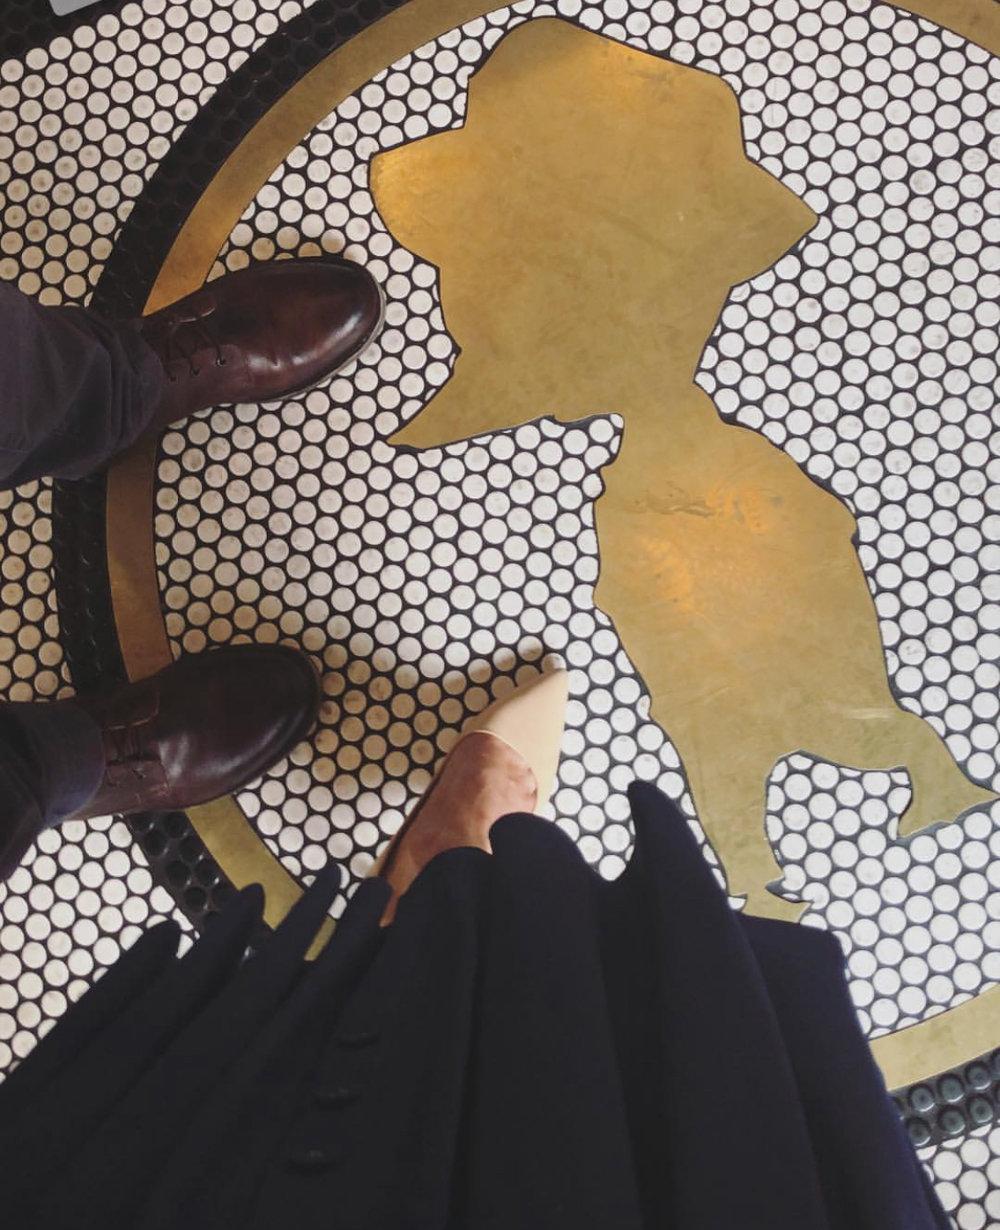 The floor mosaic at Little Duck Diner in Savannah GA